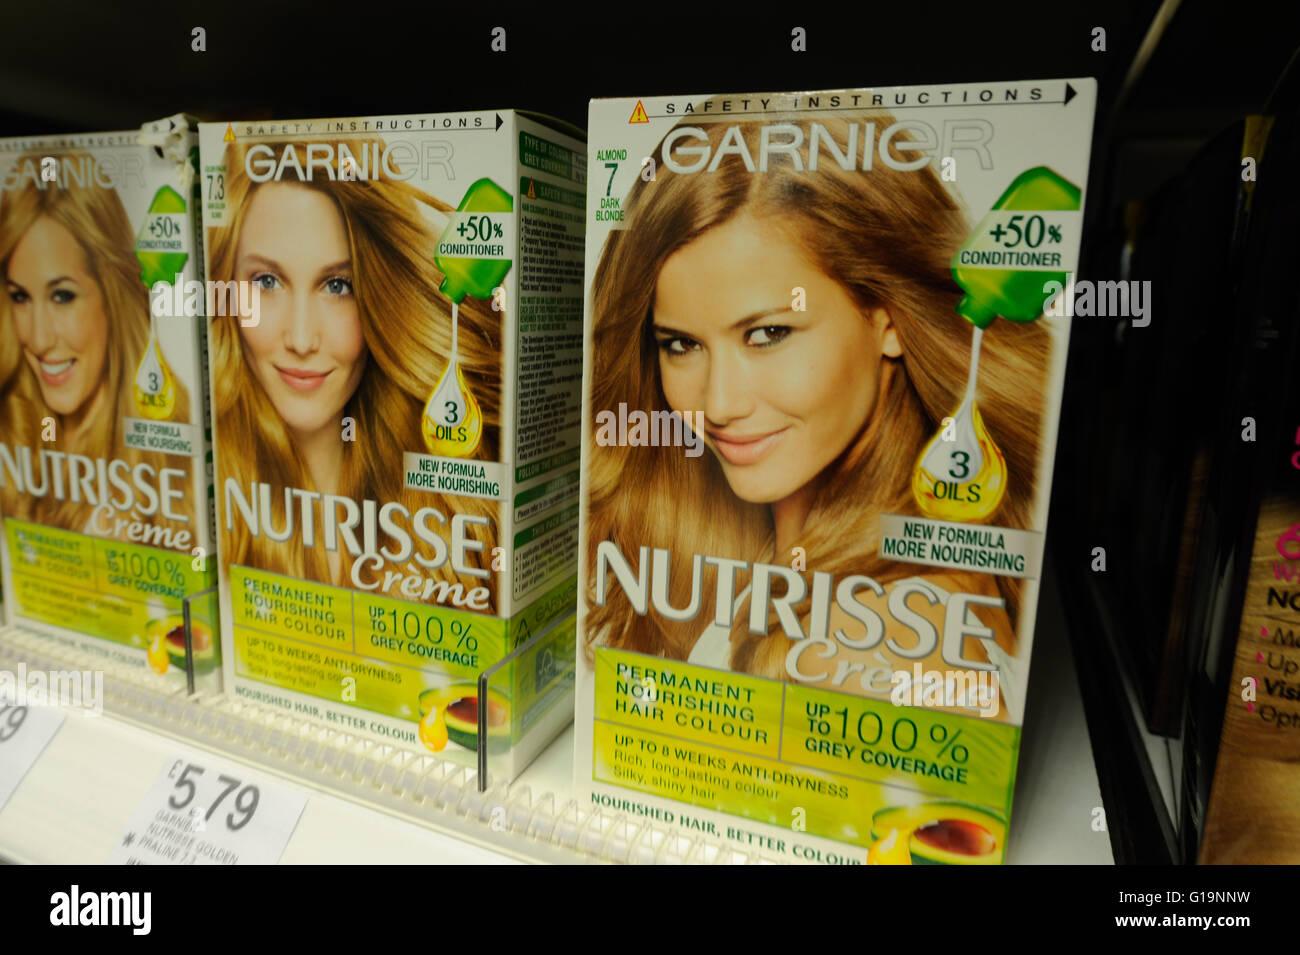 Garnier, hair care, UK - Stock Image